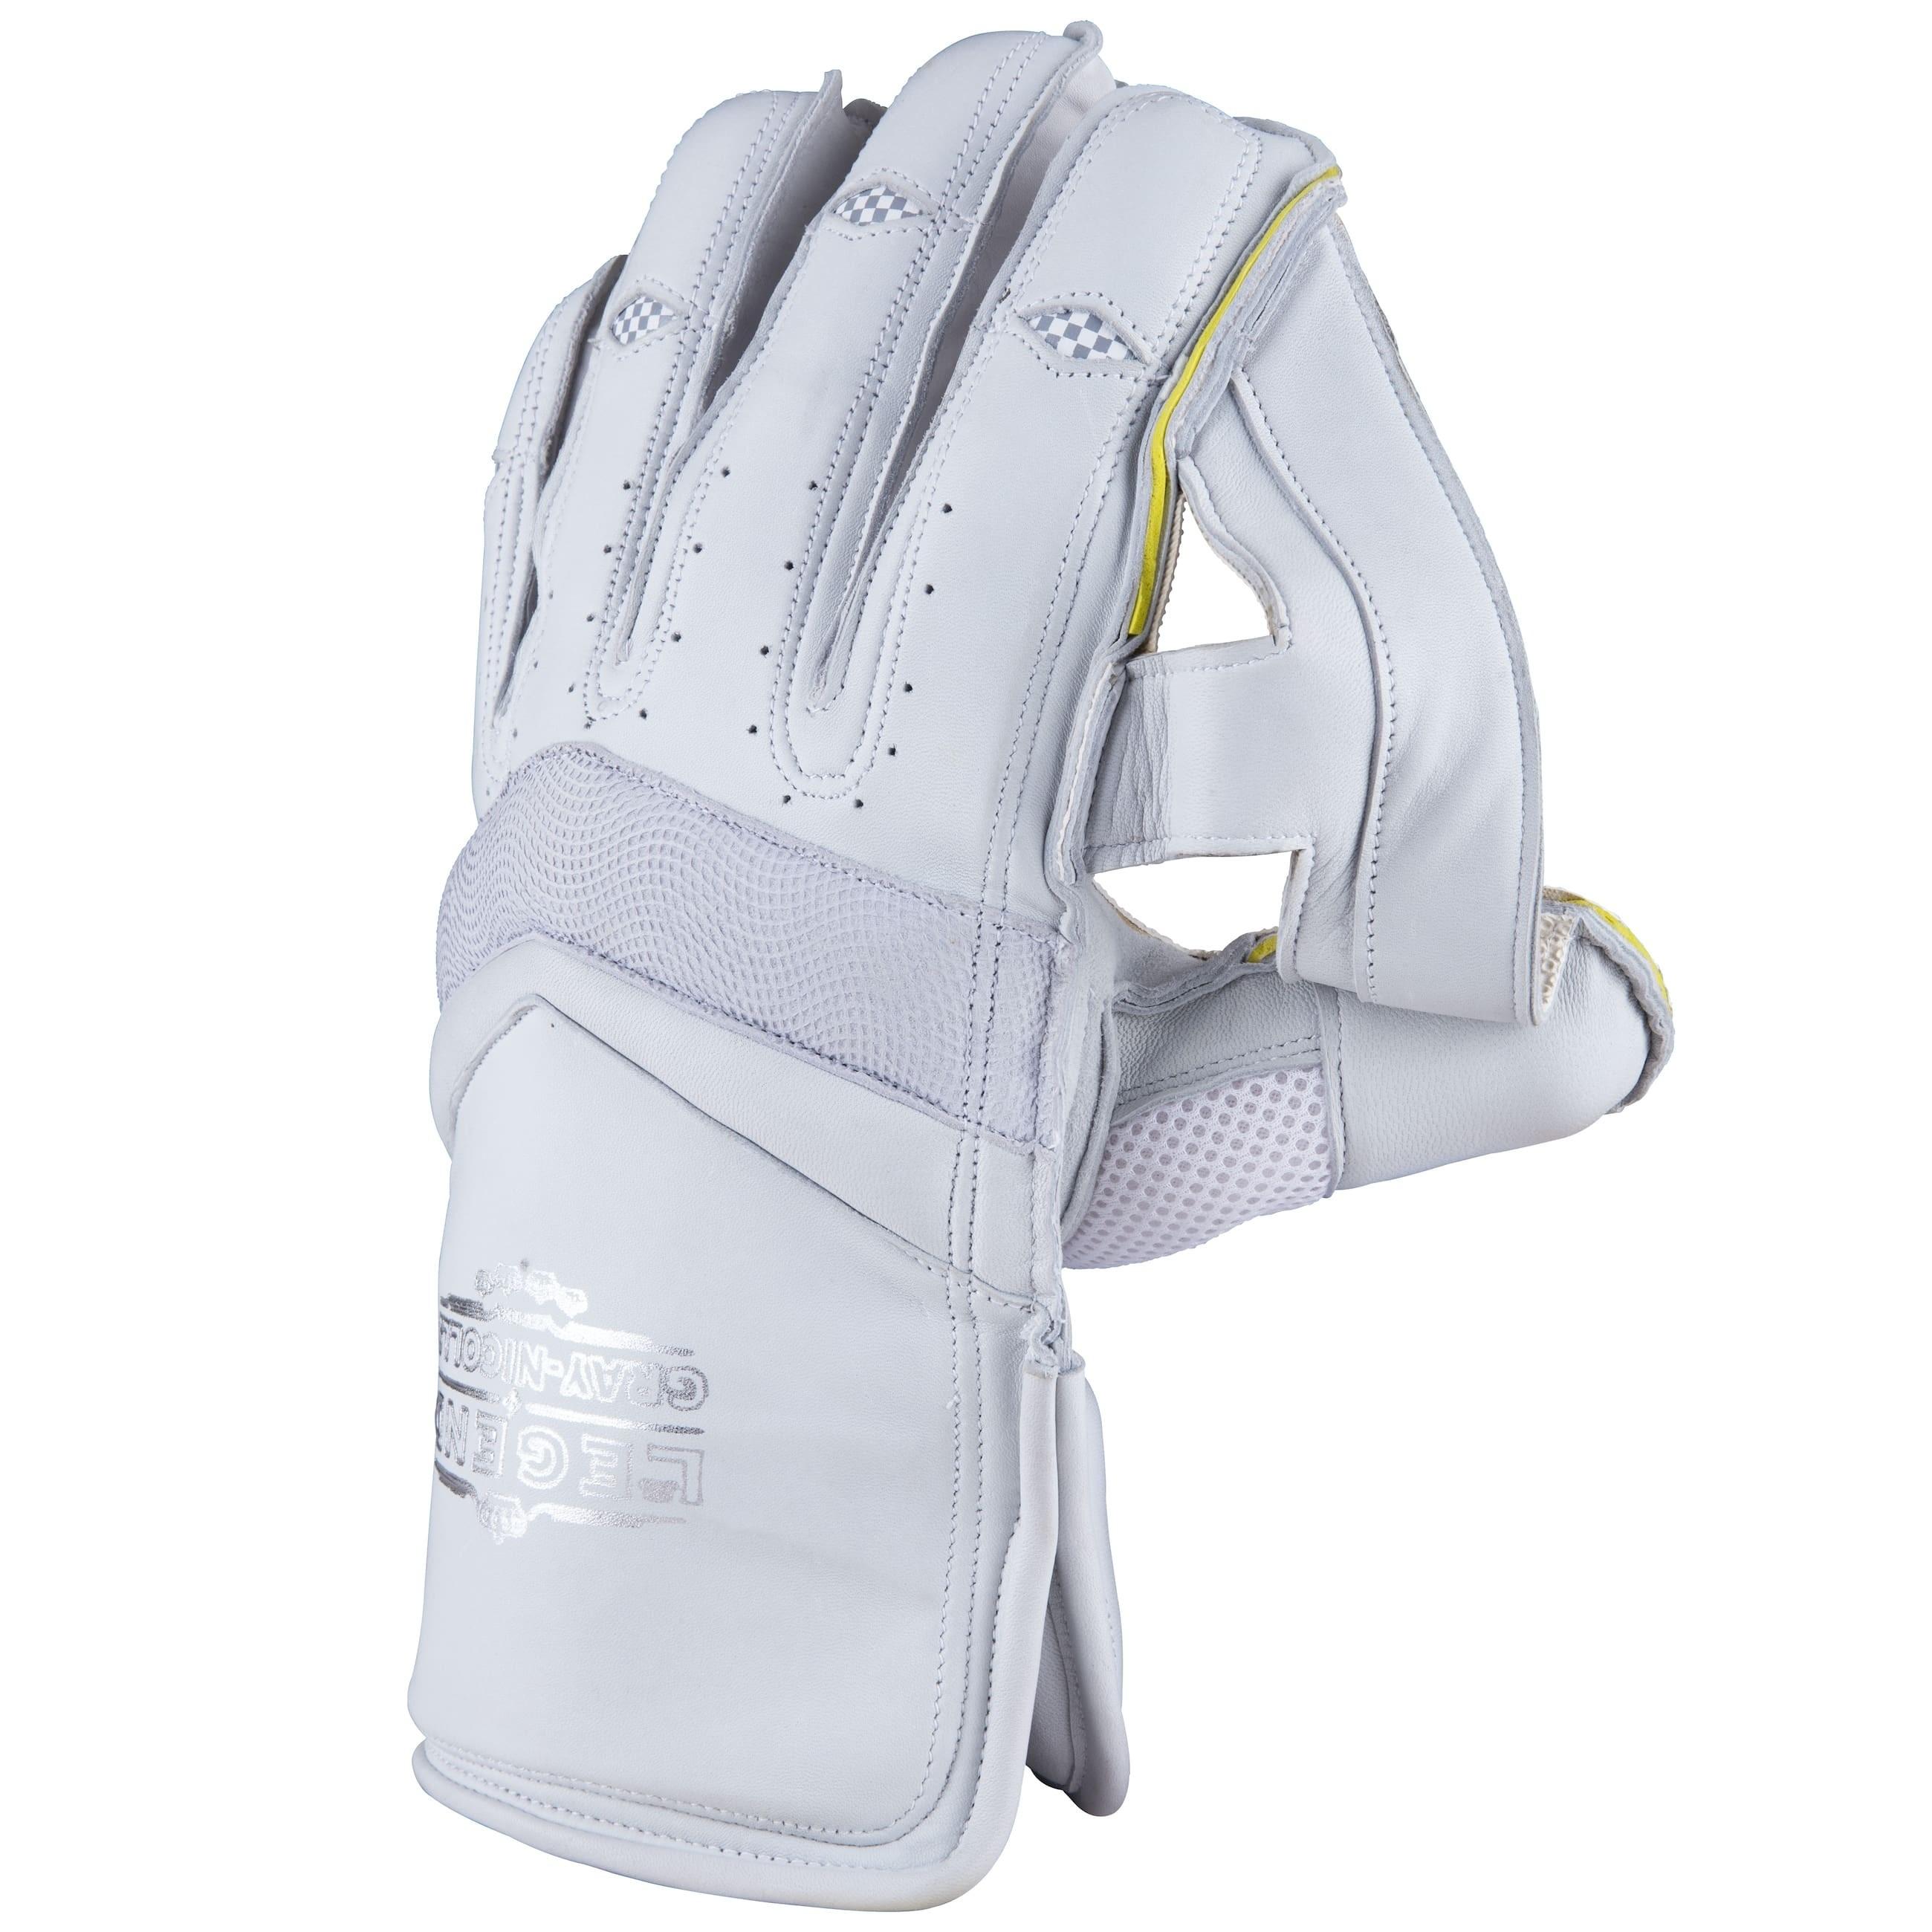 2021 Gray Nicolls Legend Wicket Keeping Gloves